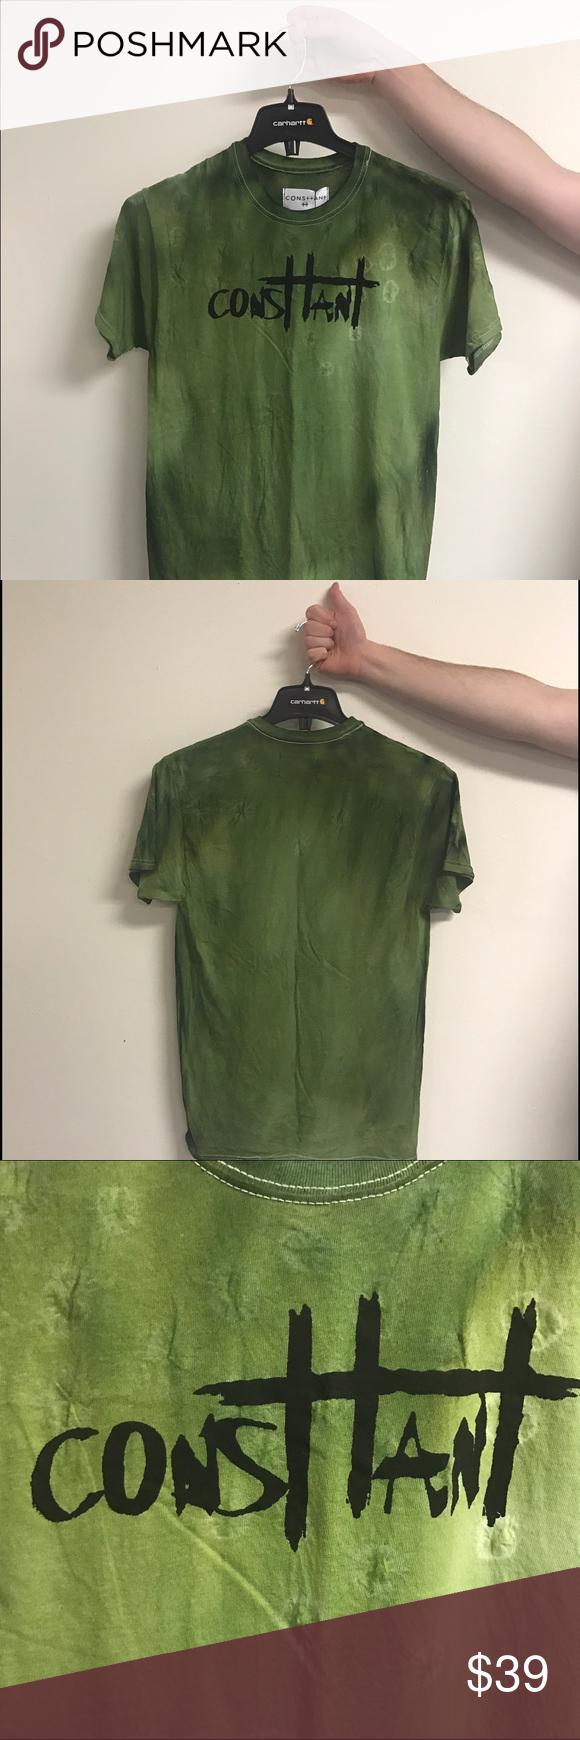 Sold Army Green Custom Made Tye Dye T Shirt Custom Made T Shirts Dye T Shirt Army Green